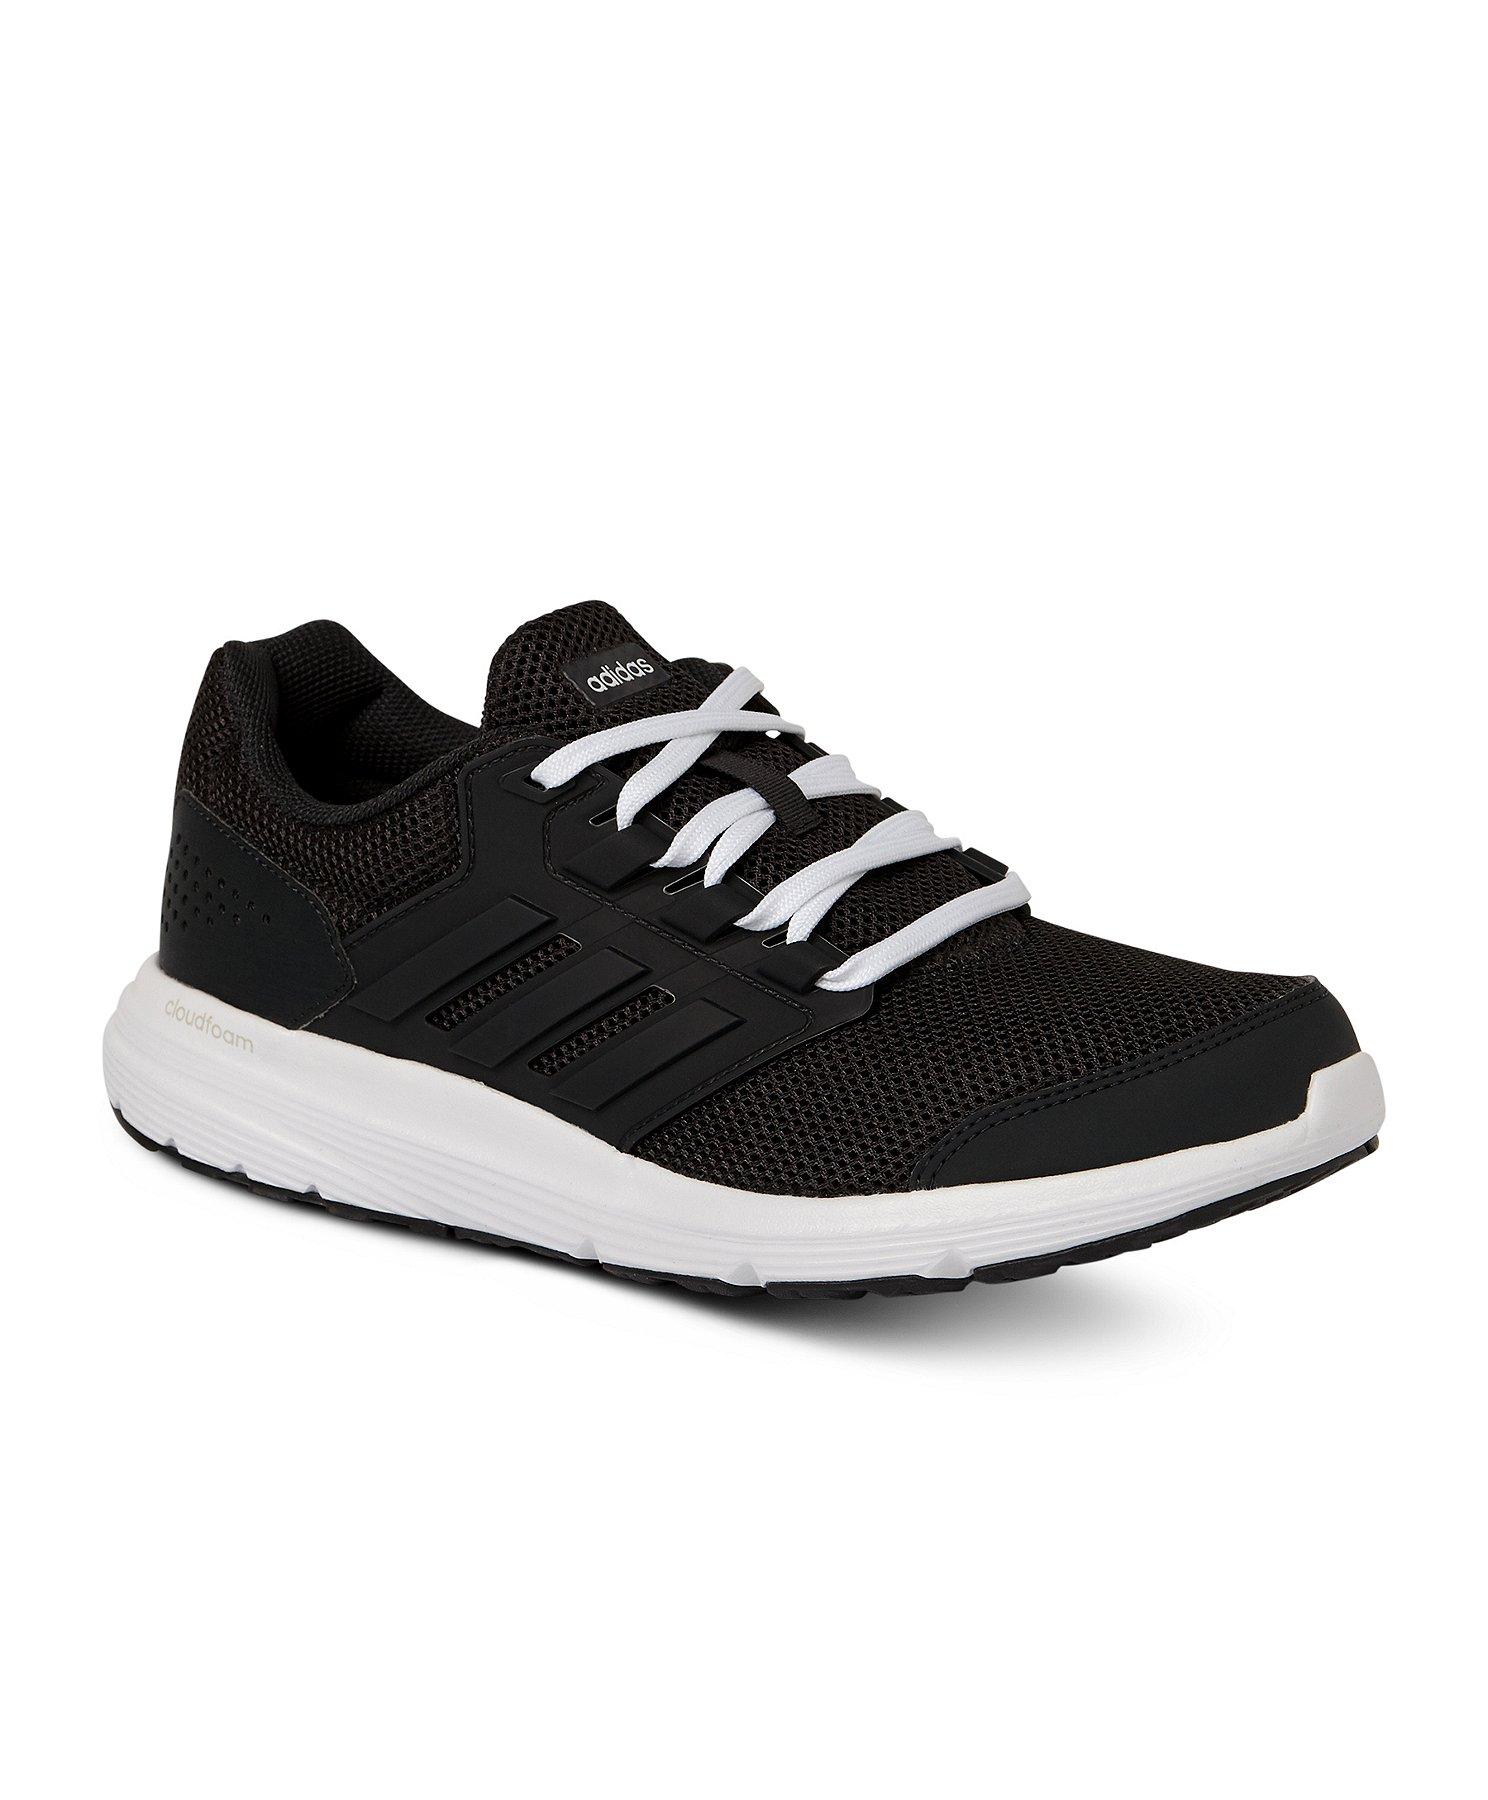 regarder e7e27 89700 Women's Galaxy 4 Sneakers